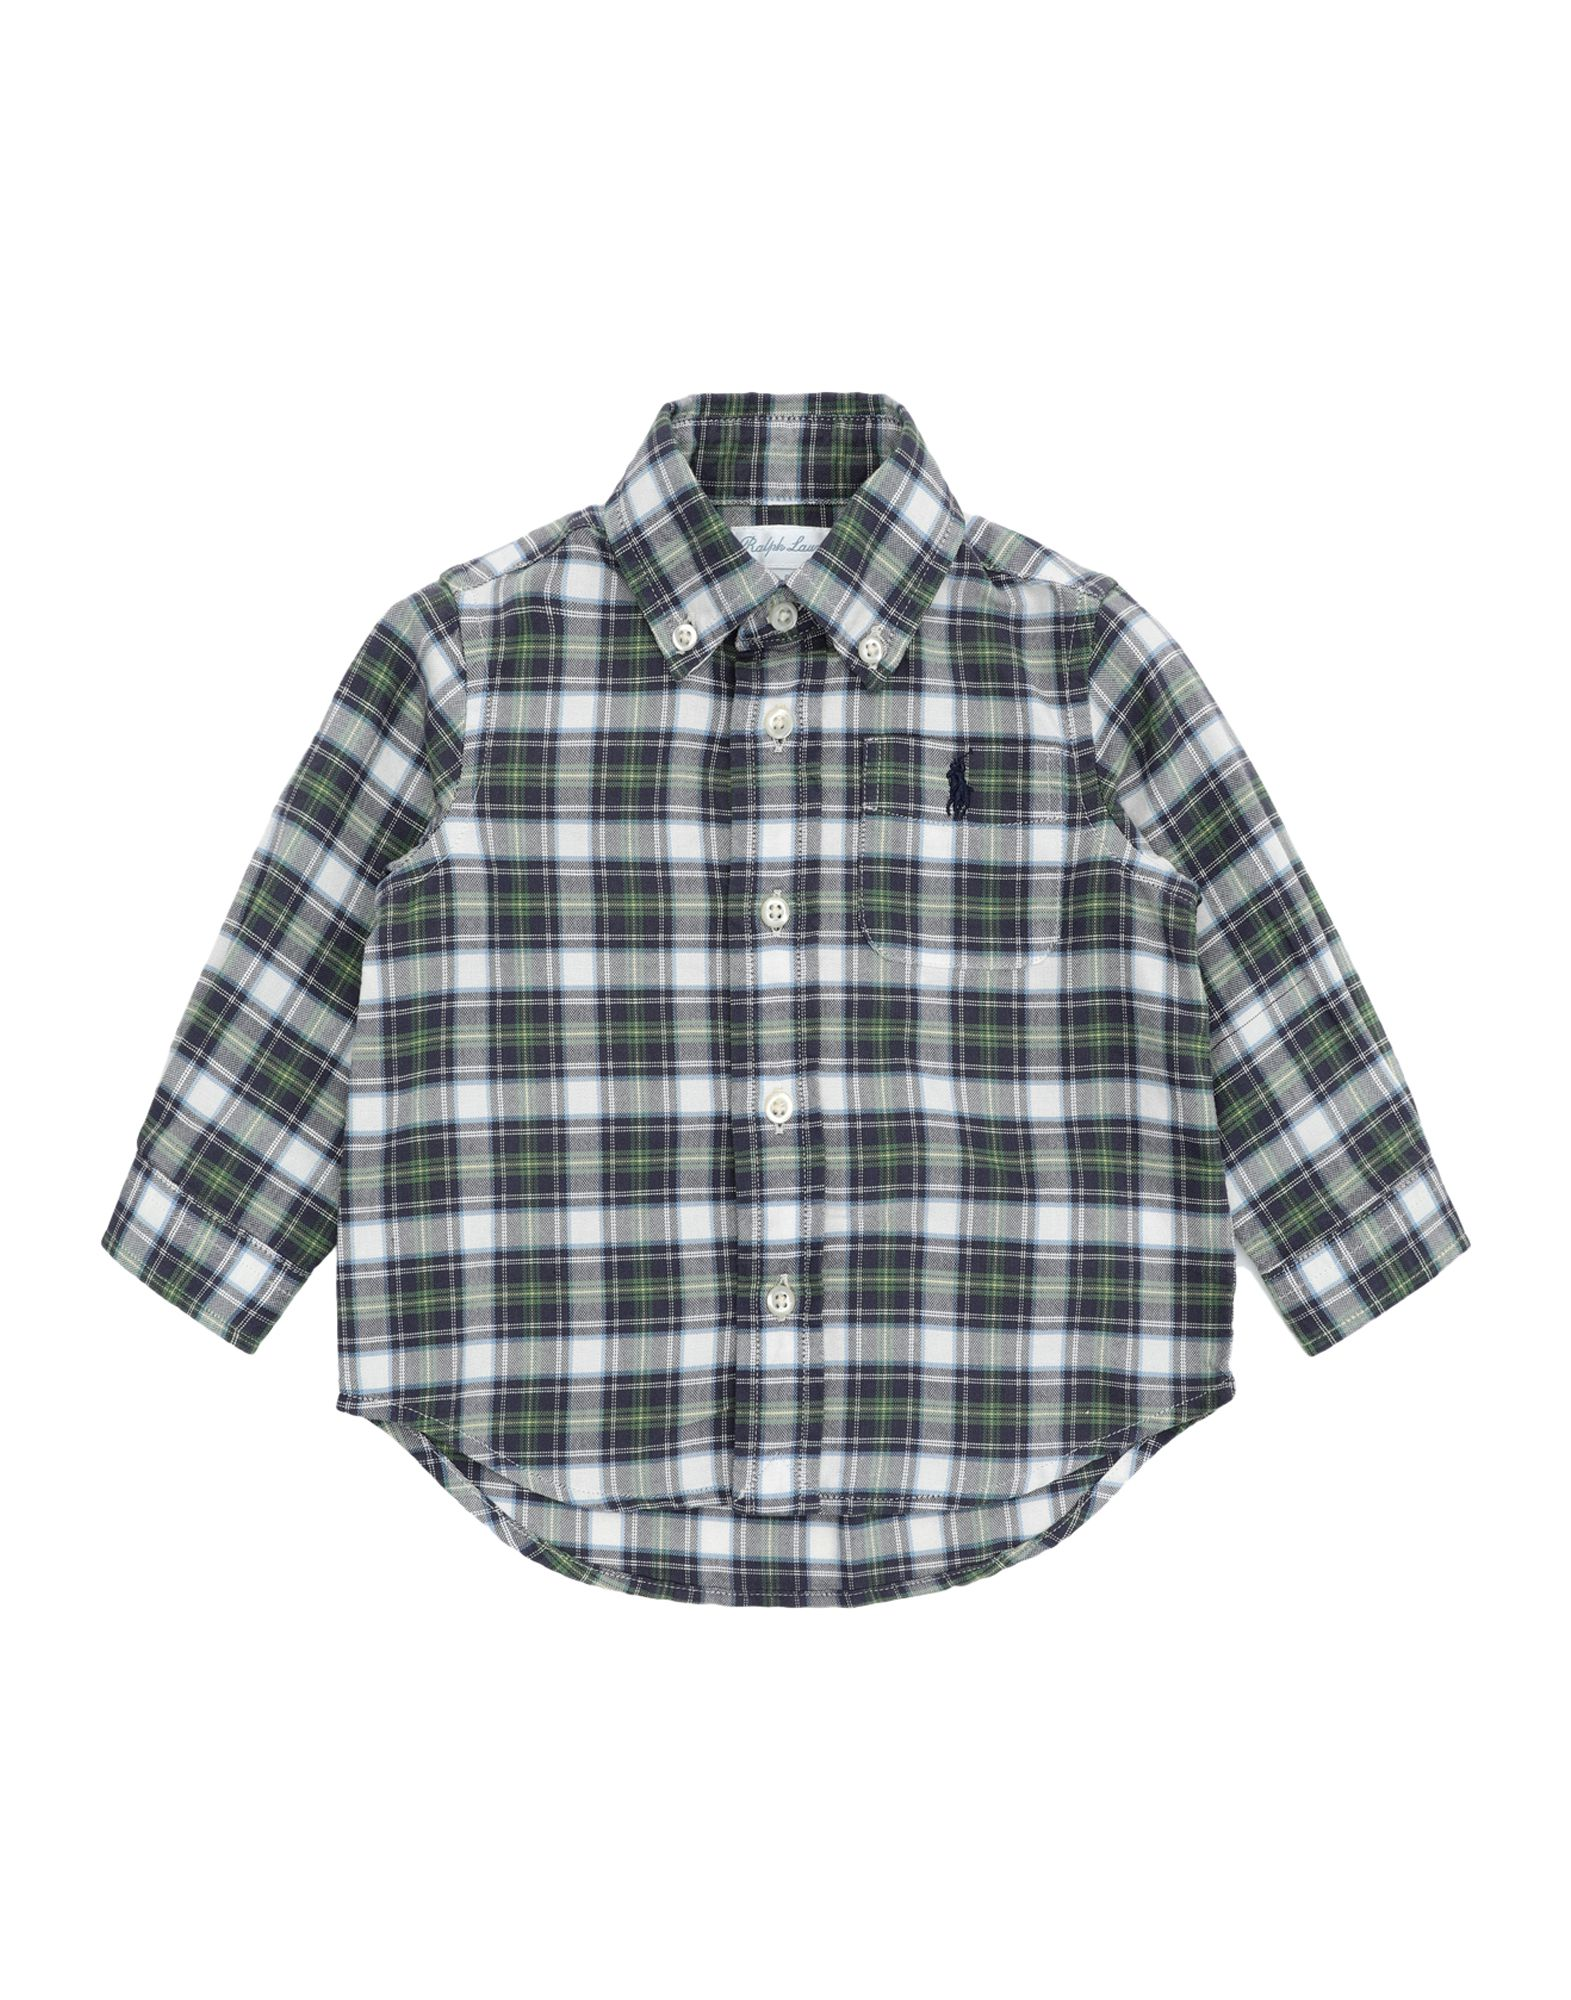 28a2d36afb4c Πουκαμισα Αγόρι Ralph Lauren 0-24 μηνών - Παιδικά ρούχα στο YOOX